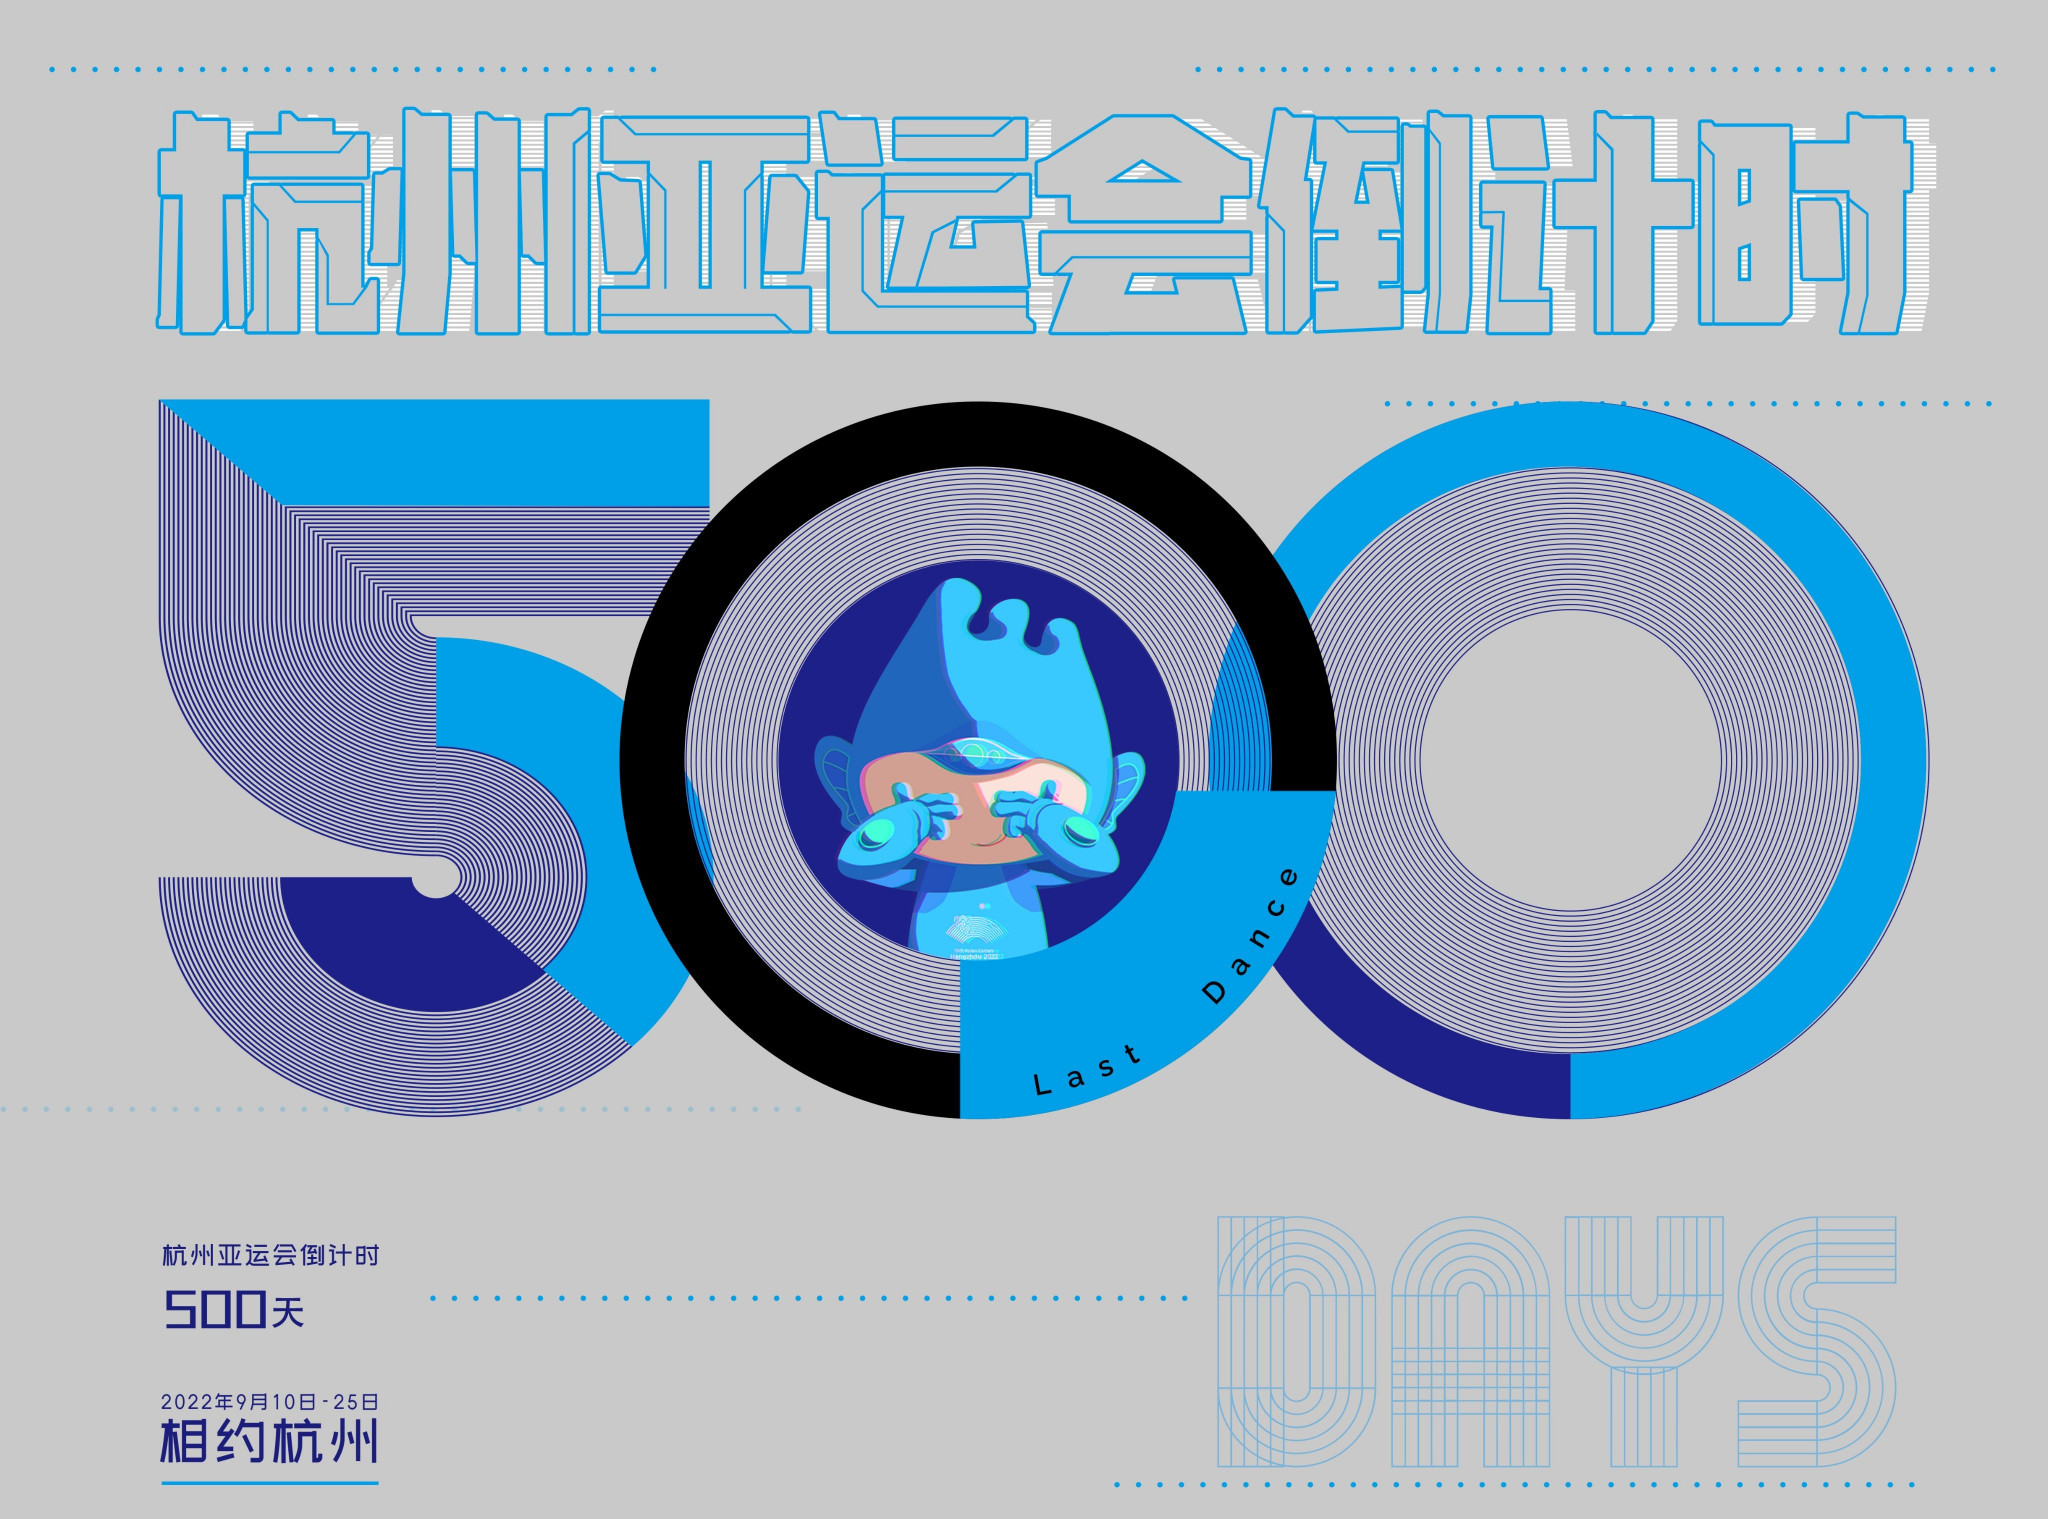 Countdown clocks light up to mark 500 days until Hangzhou 2022 Asian Games